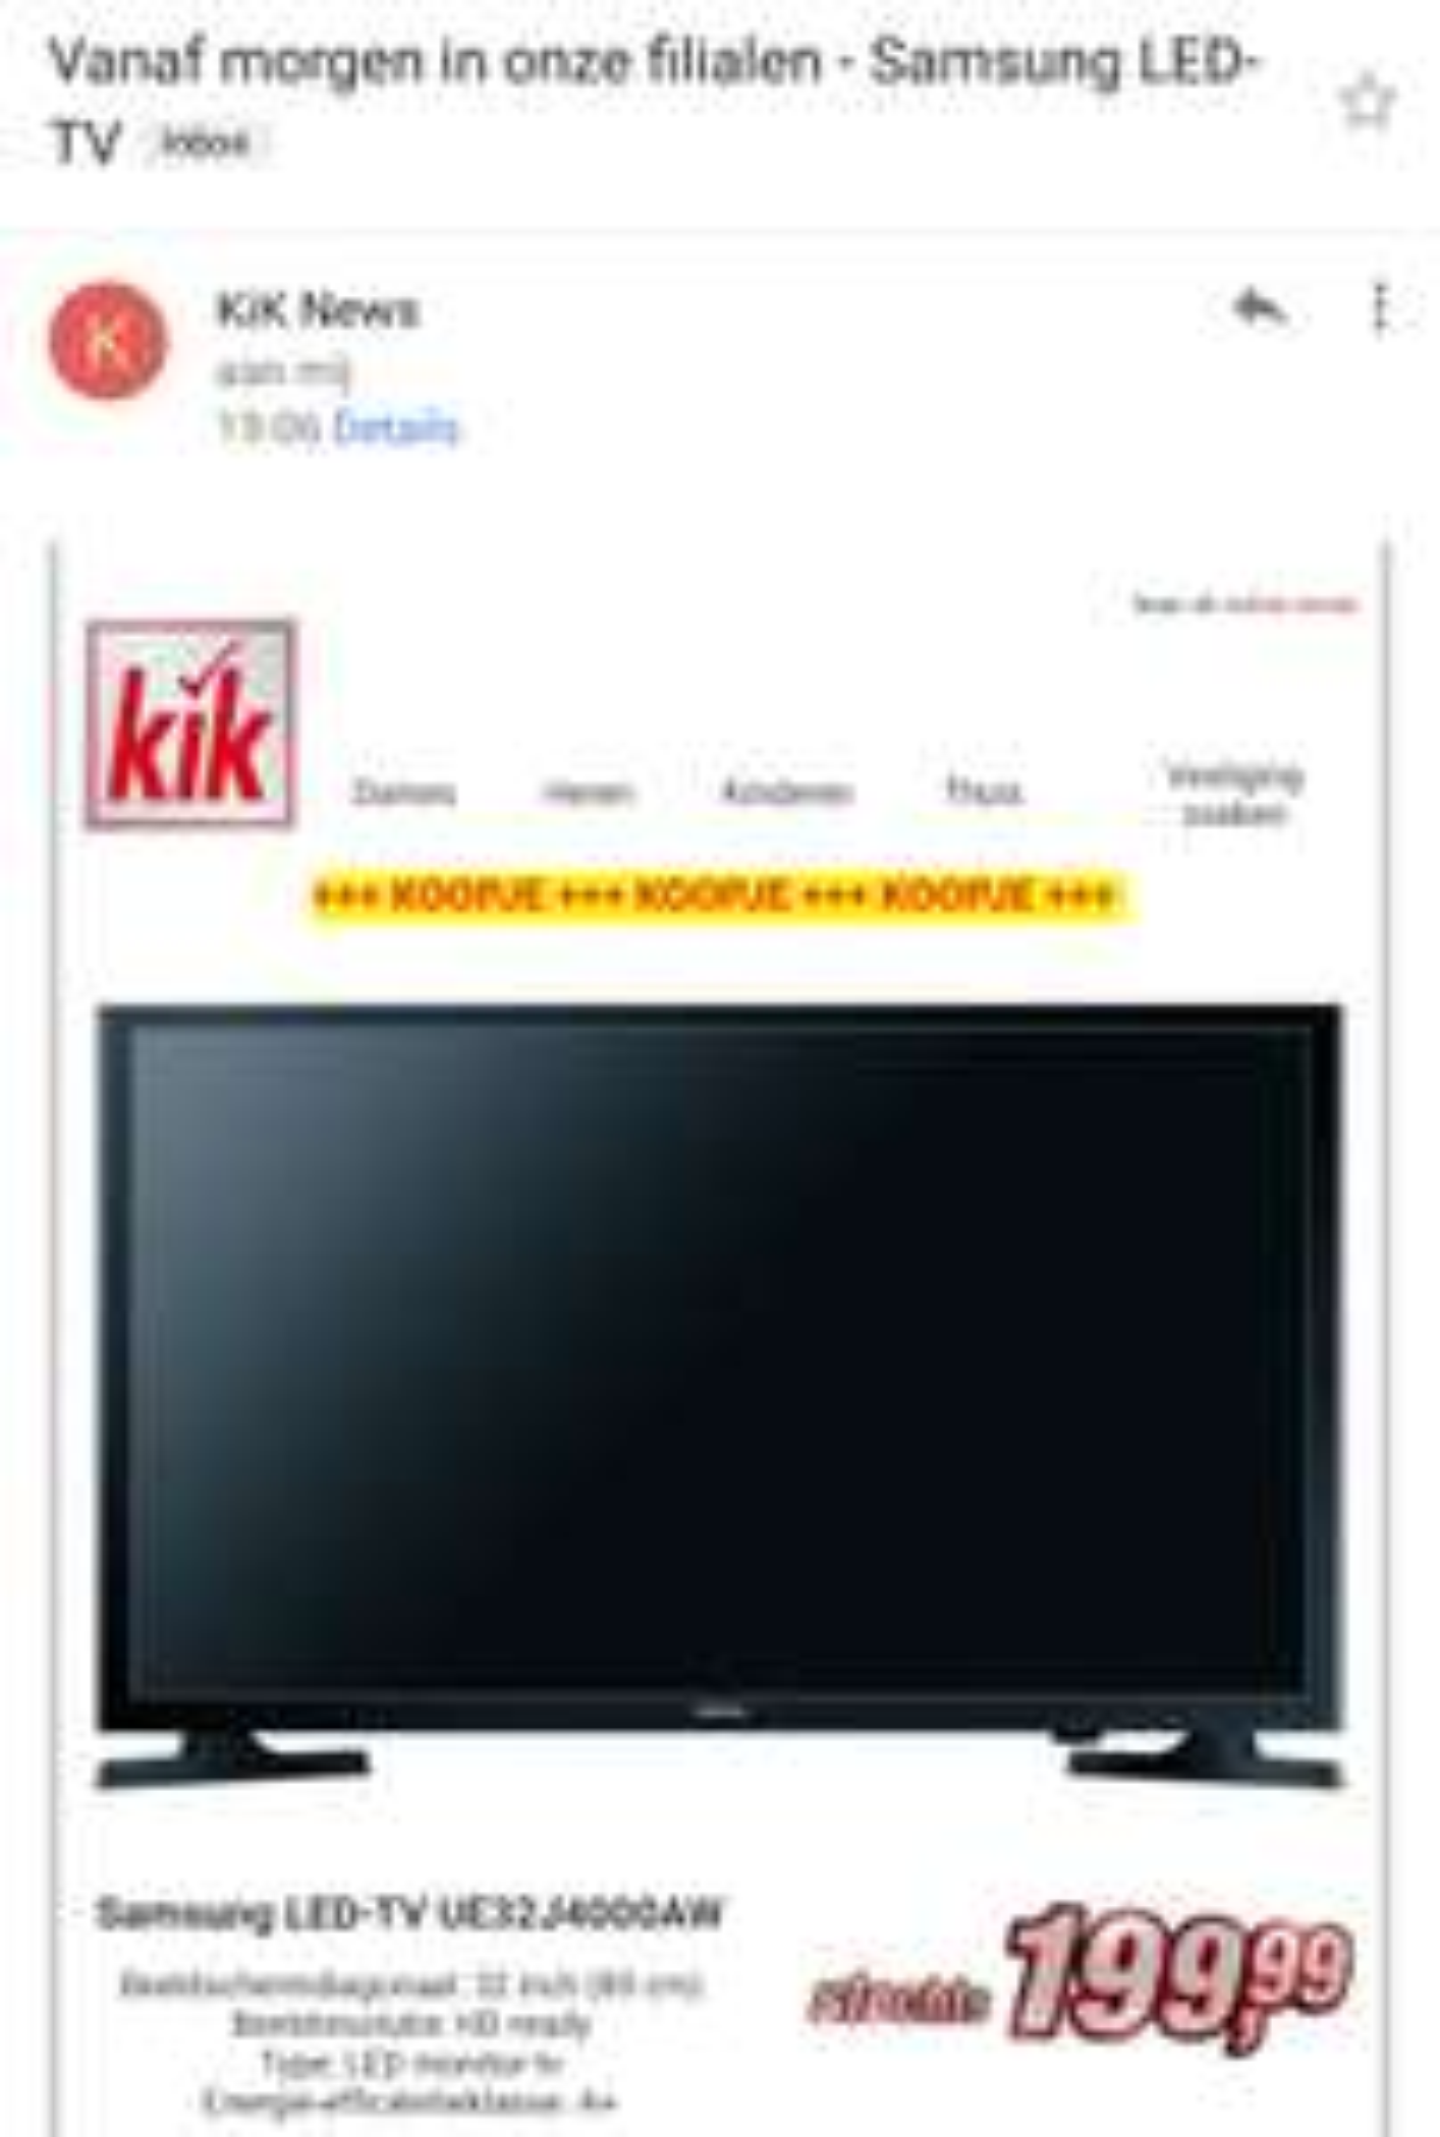 Samsung UE32J4000AW led tv voor €199,99 @ Kik winkels